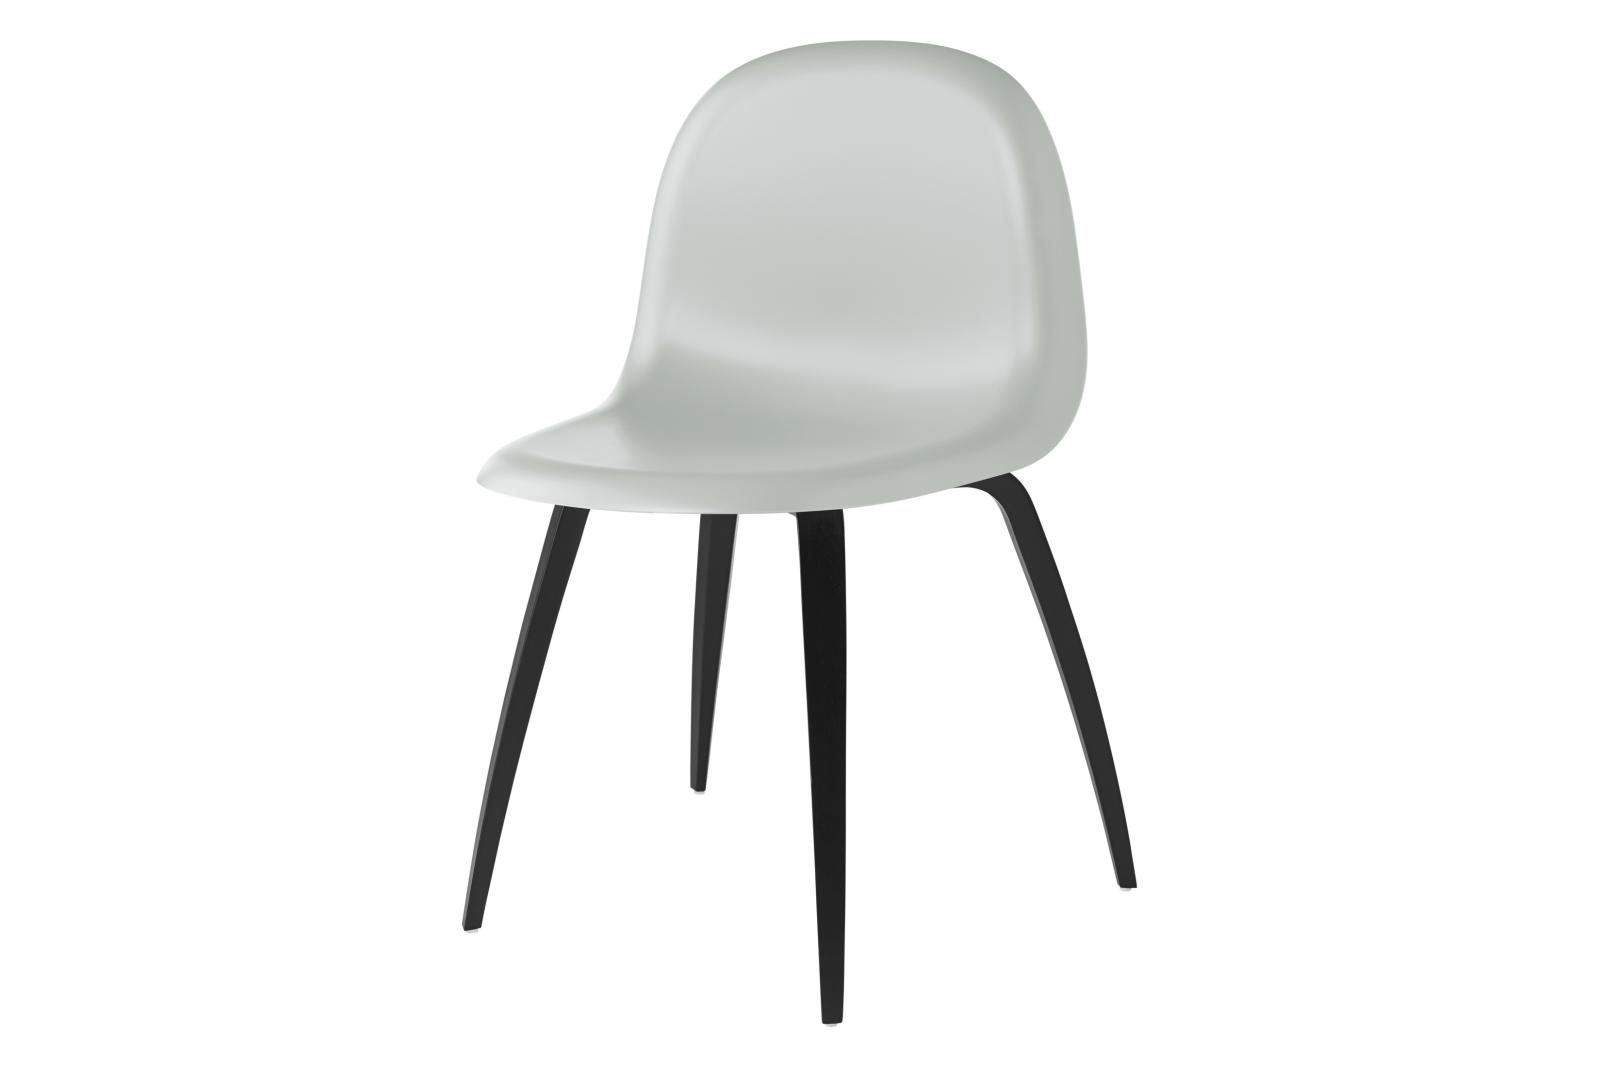 Gubi 3D Wood Base Dining Chair - Unupholstered Gubi HiRek Moon Grey, Gubi Wood Black Stained Beech